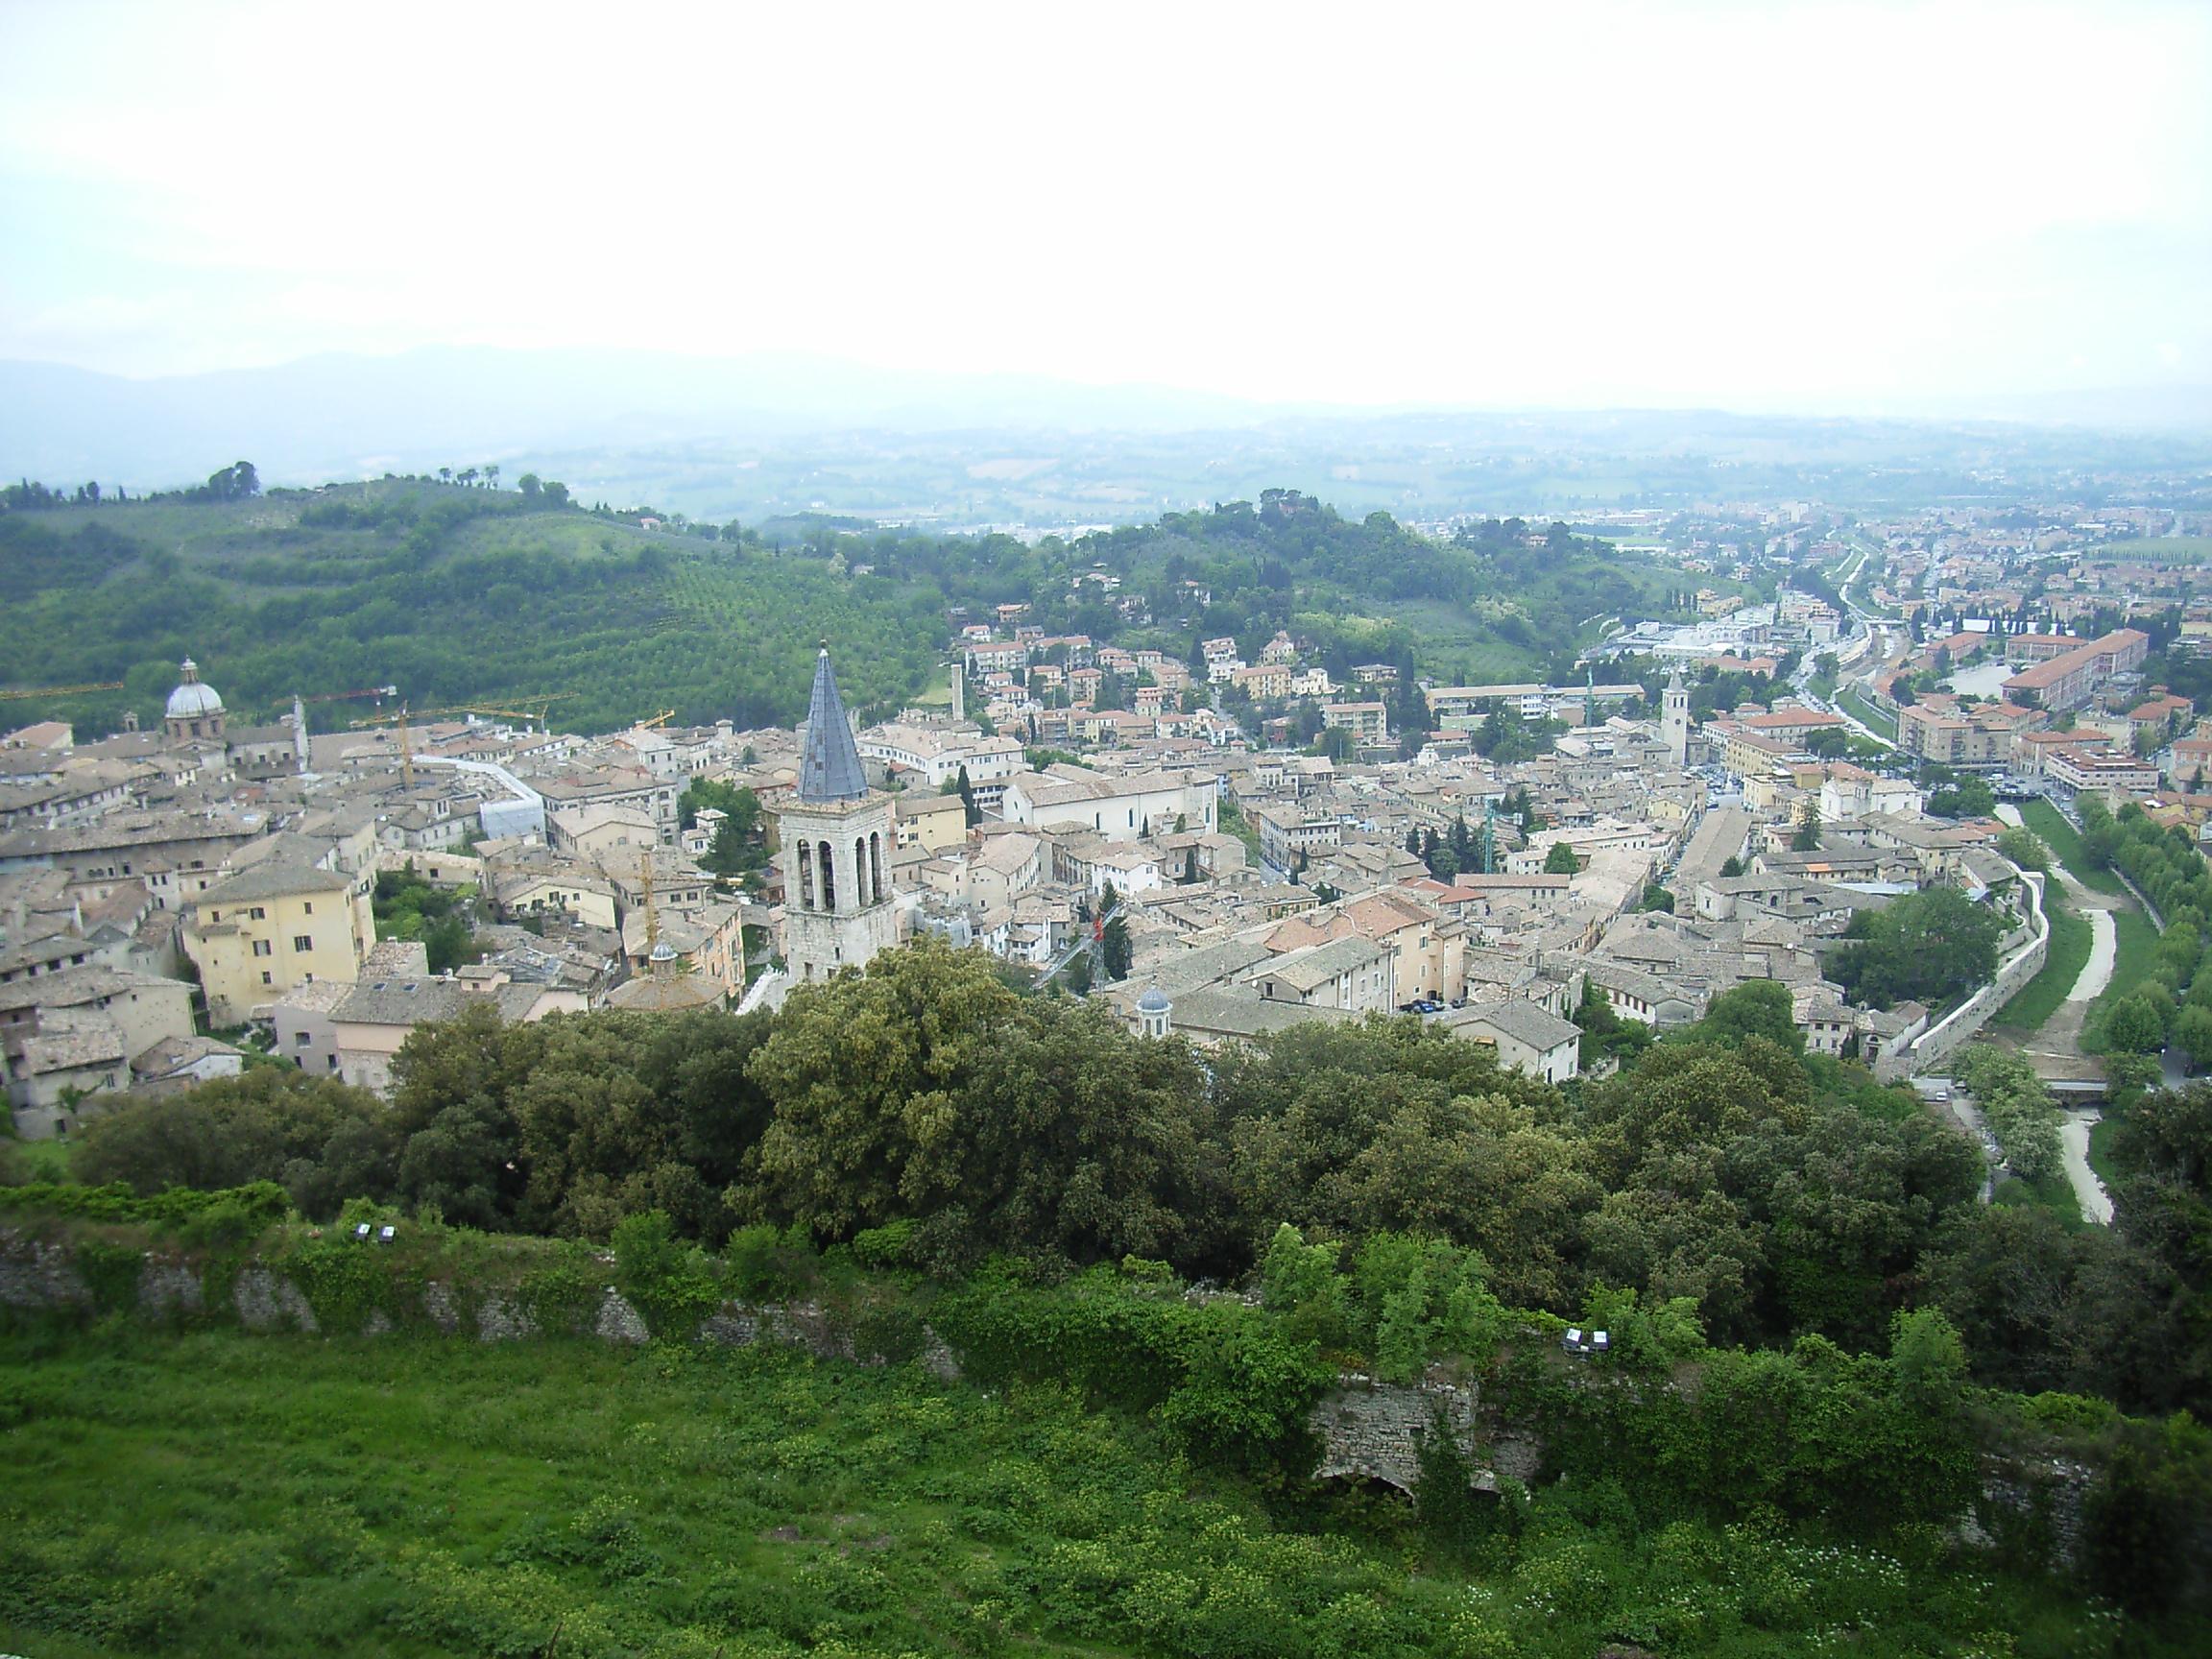 Spoleto Italy  city photos : Original file  2,304 × 1,728 pixels, file size: 1.65 MB, MIME ...